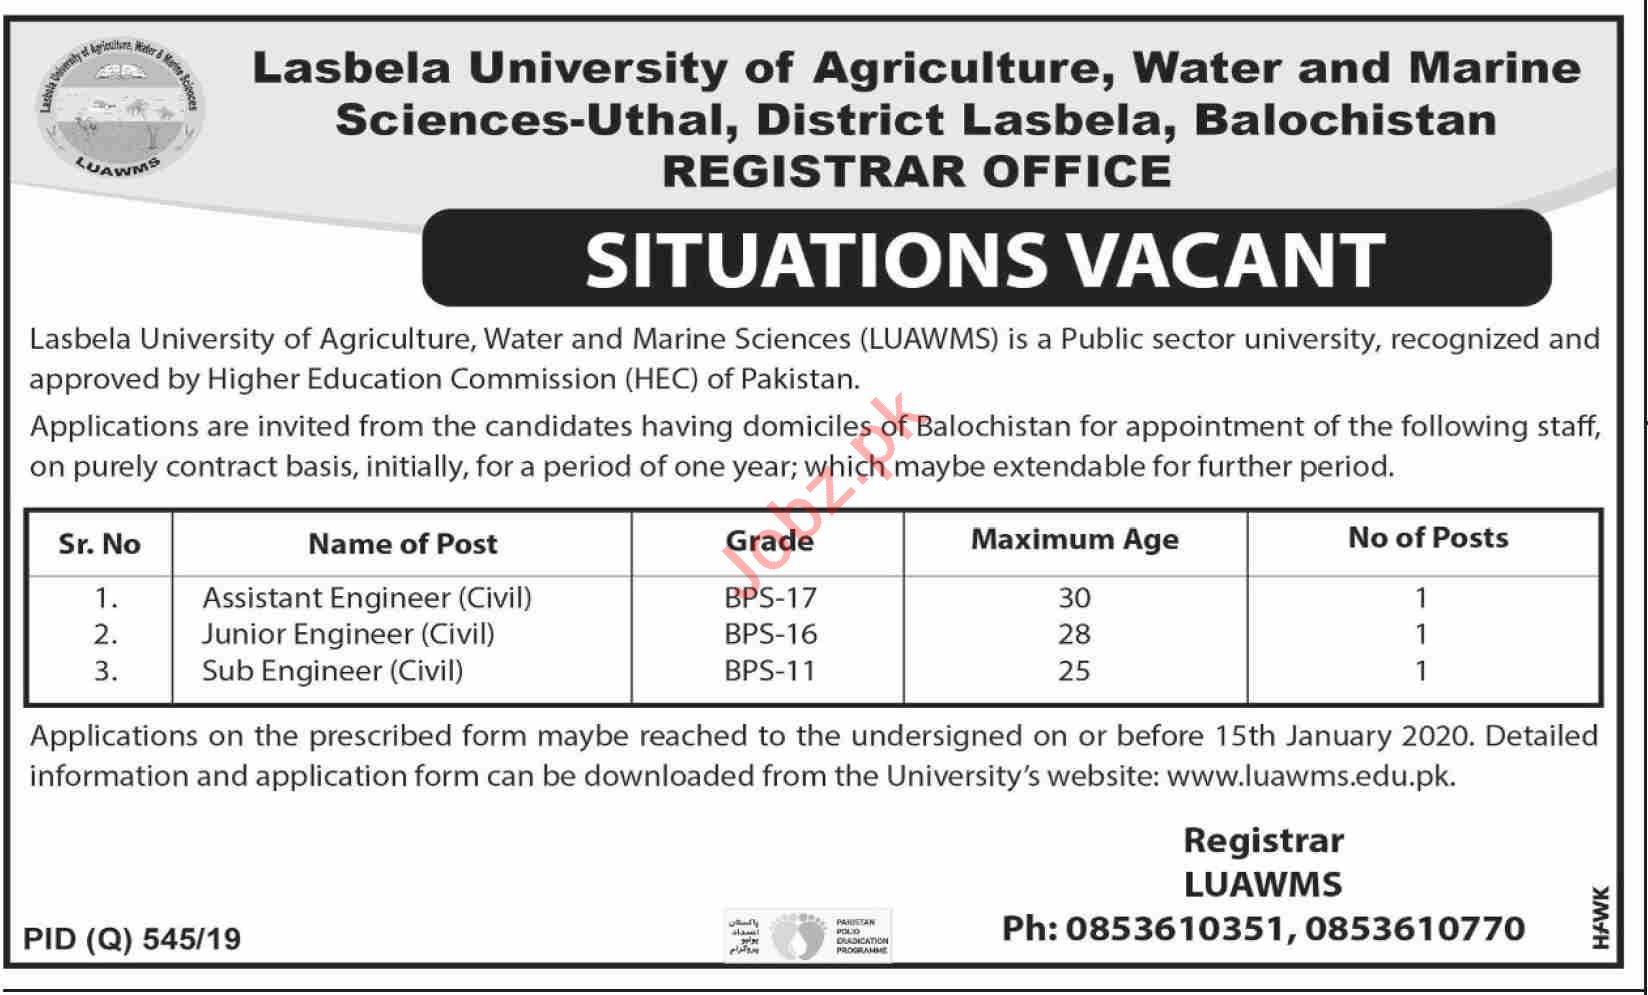 LUAWMS Lasbela University Jobs 2020 for Engineers